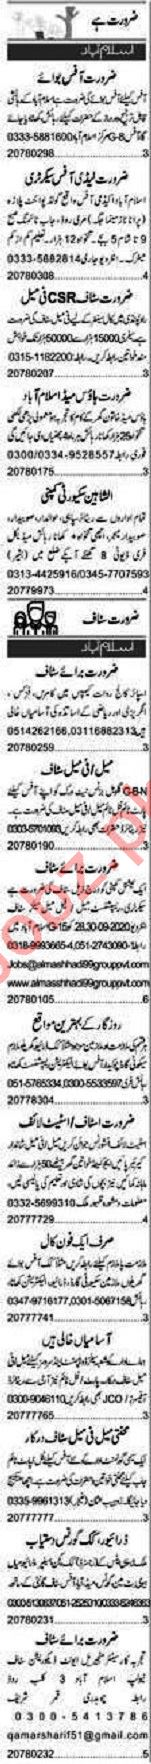 Express Sunday Islamabad Classified Ads 27 Sept 2020